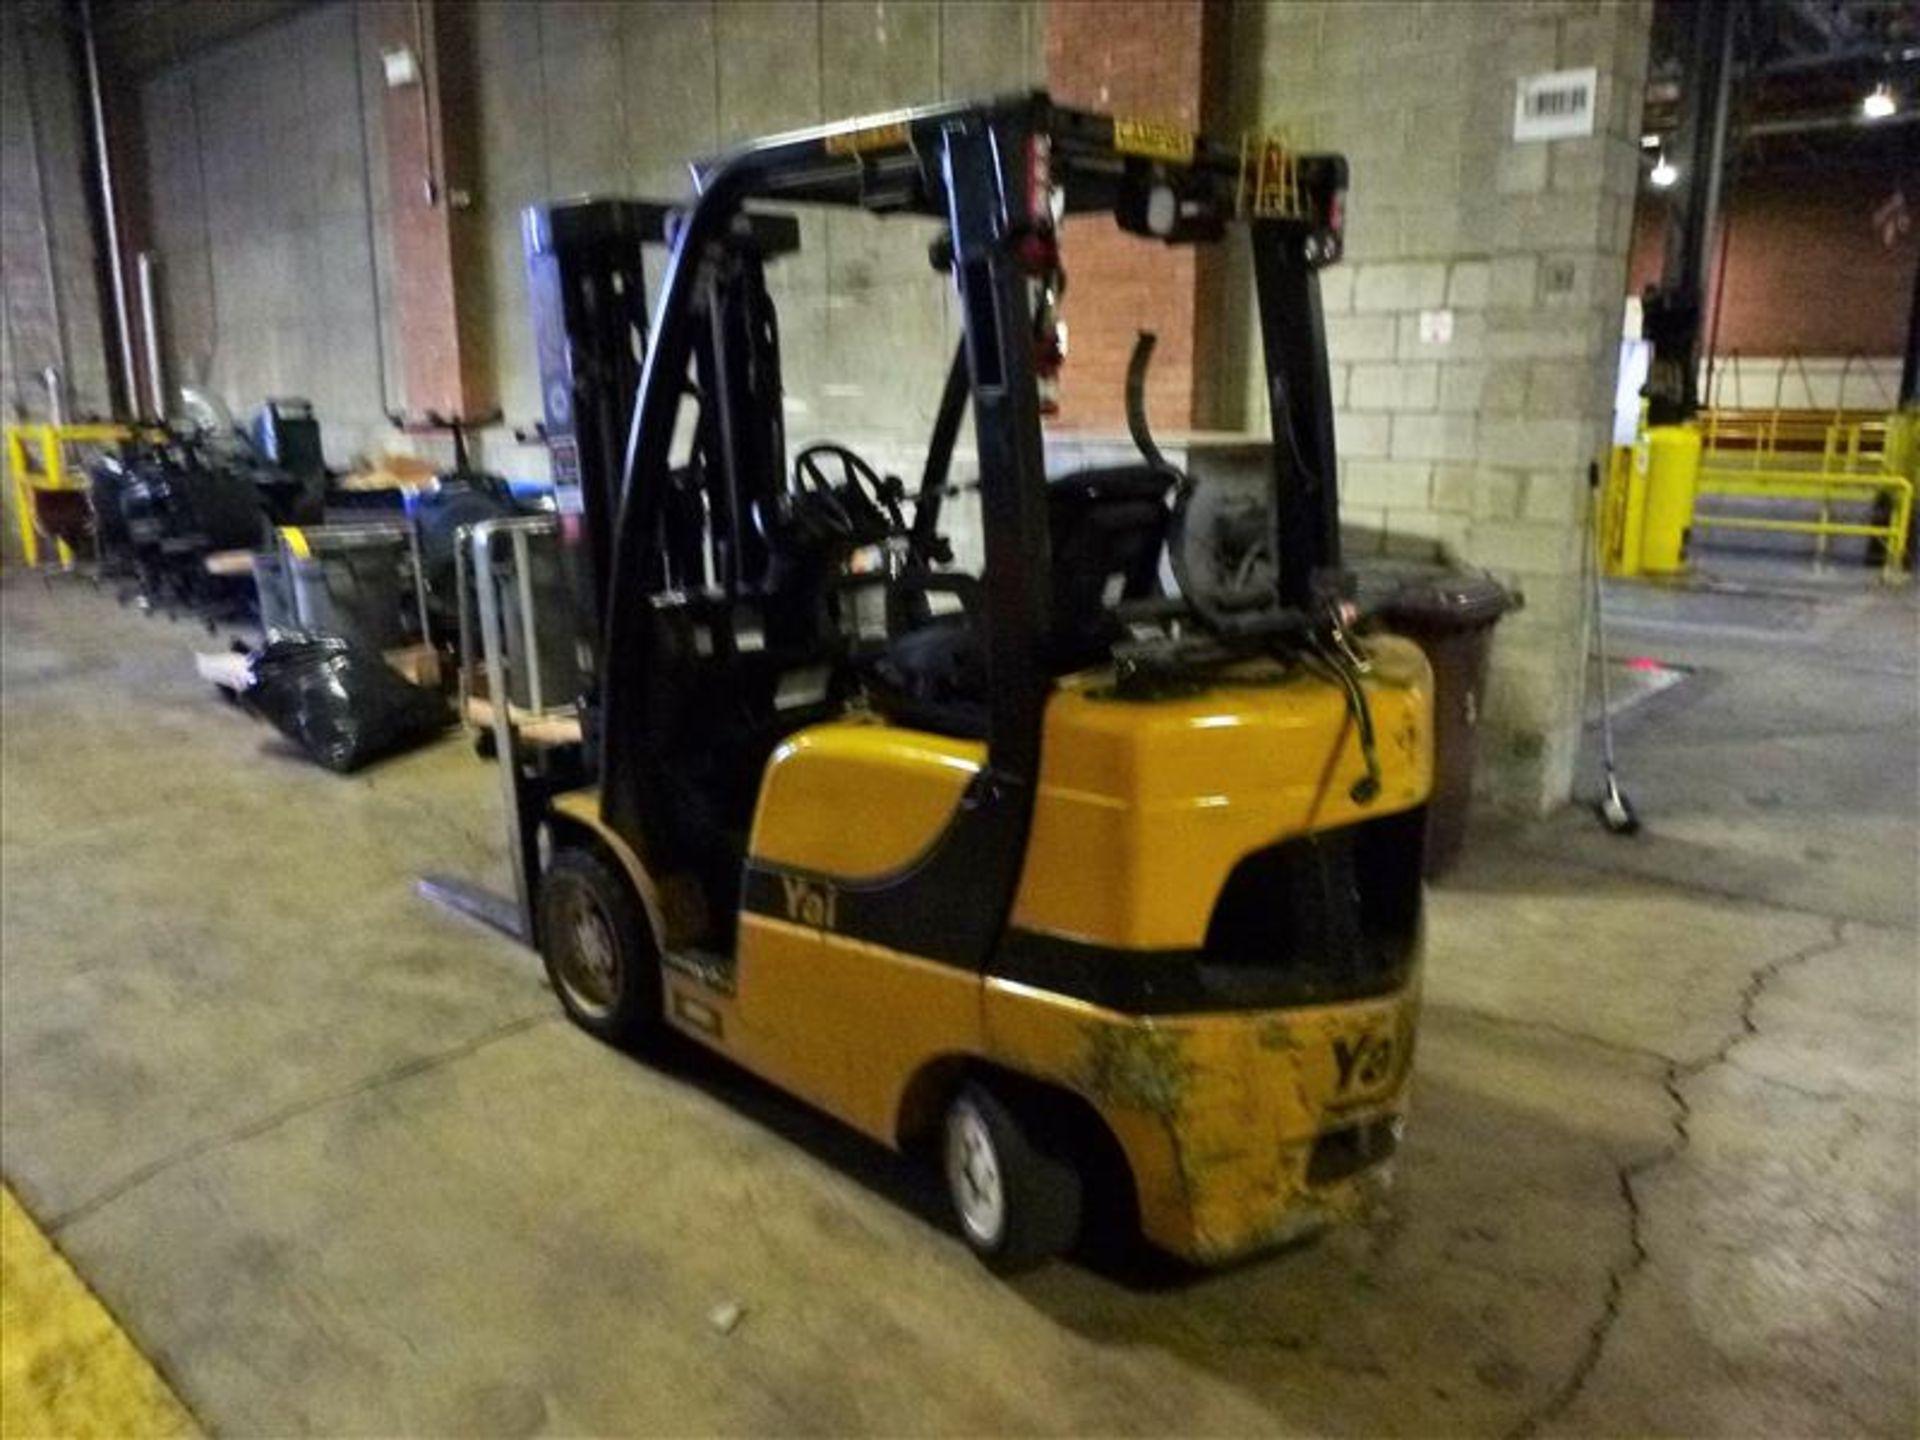 Yale fork lift truck, mod. GLC060VXNDAE085, ser. no. C910V01994N, LPG, 5500 lbs cap., 181 in. lift - Image 2 of 4